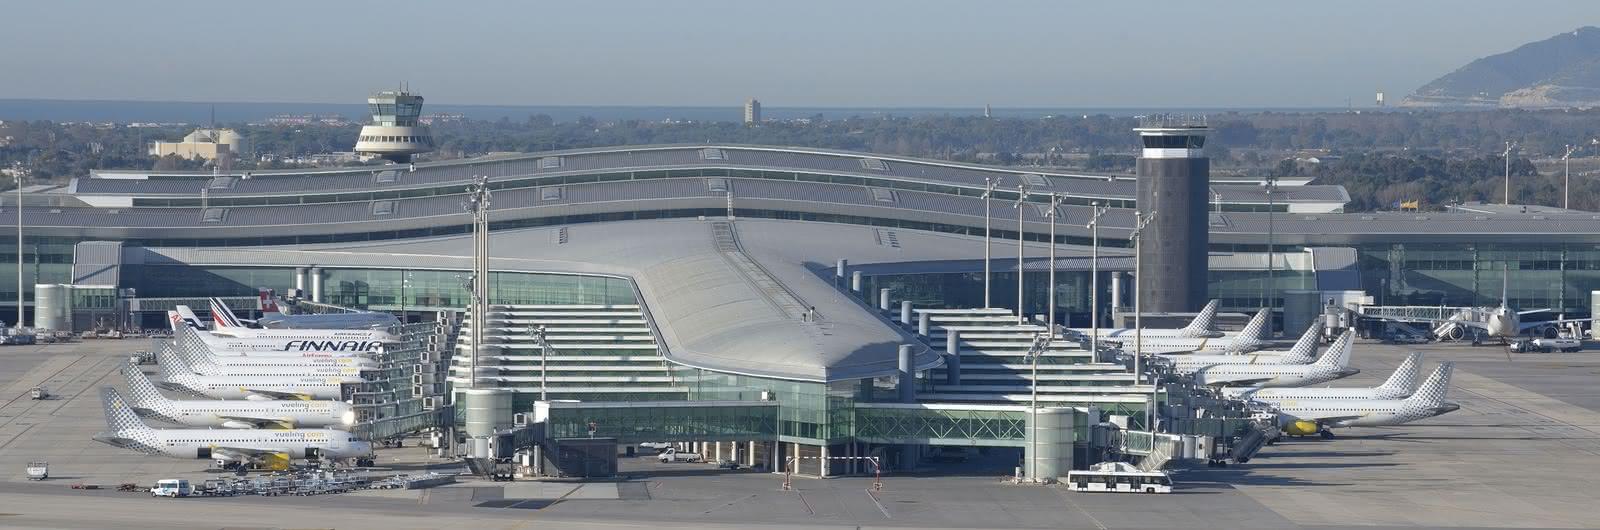 barcelona airport header